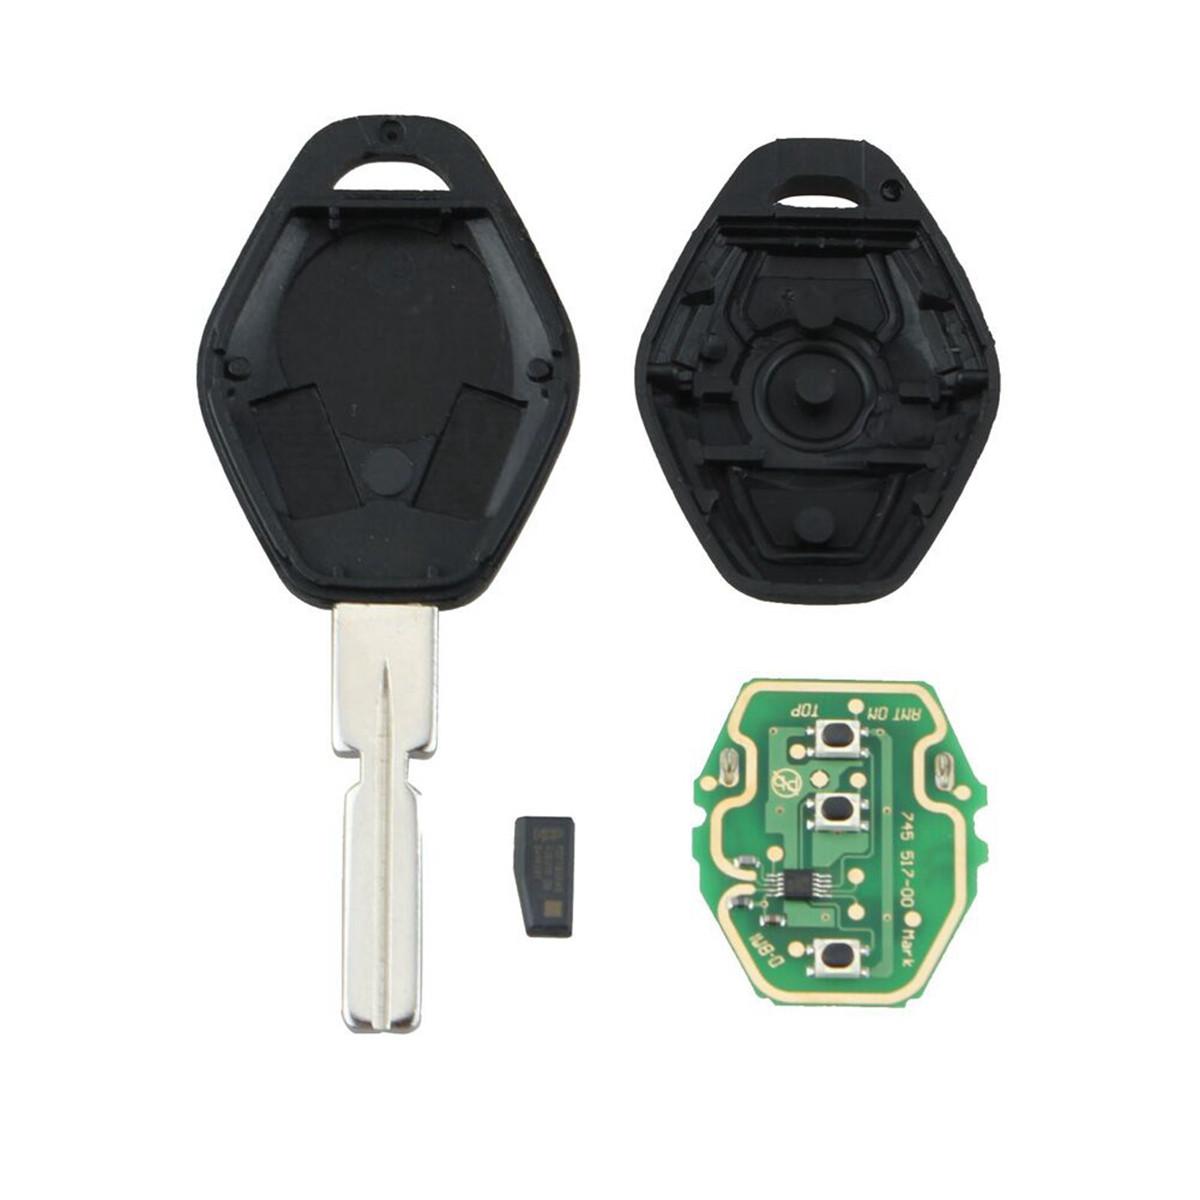 3 BTN 315MHz ID44 Chip HU58 Дистанционный Ключ для BMW 3 5 7 Series E38 E39 E46 - фото 4